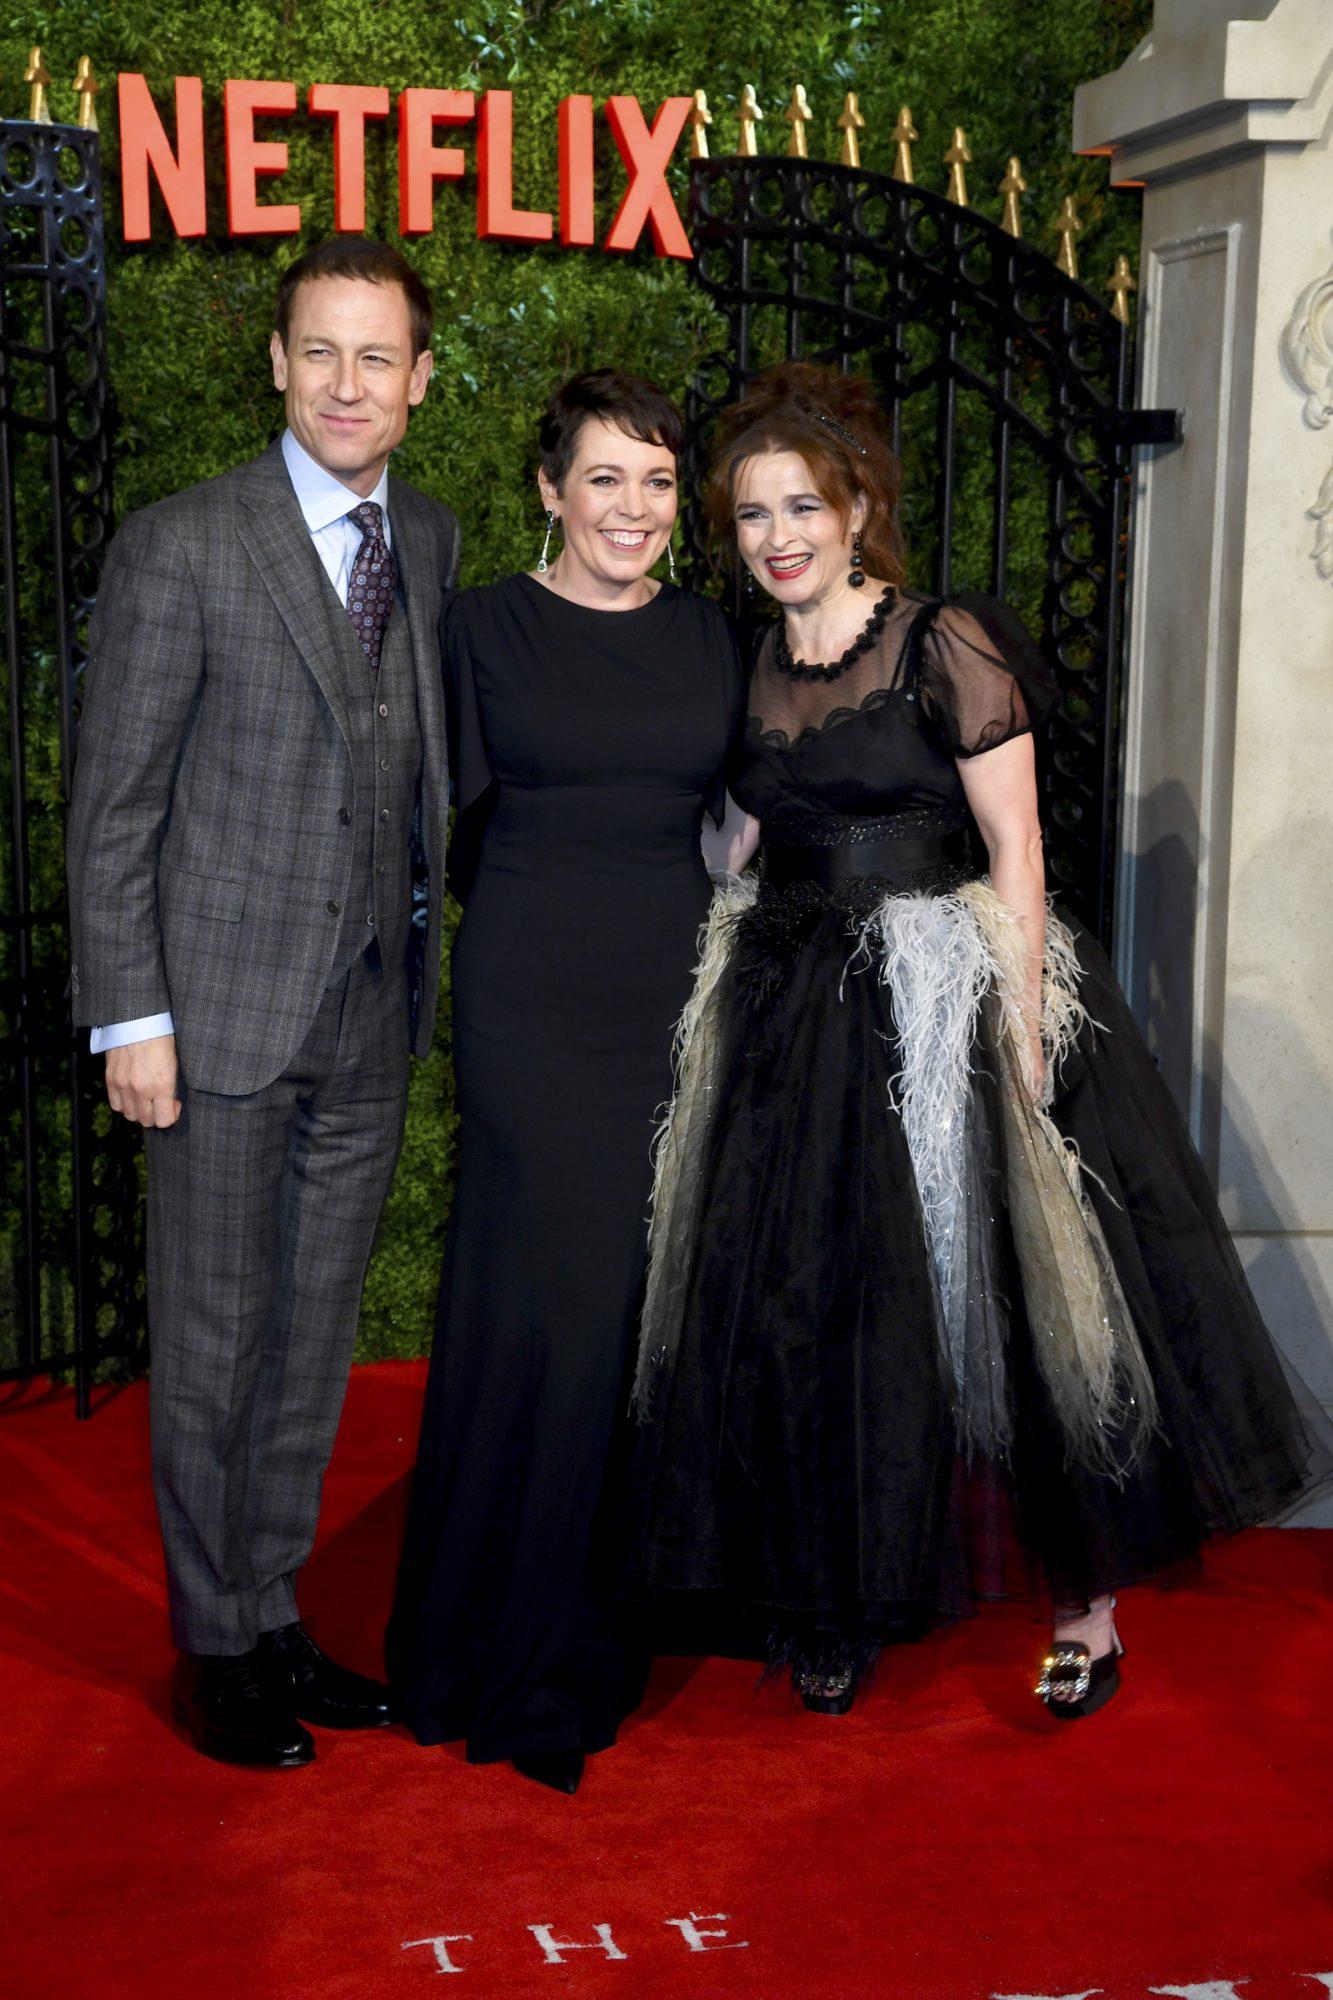 Olivia Colman, Tobias Menzies and Helena Bonham Carter